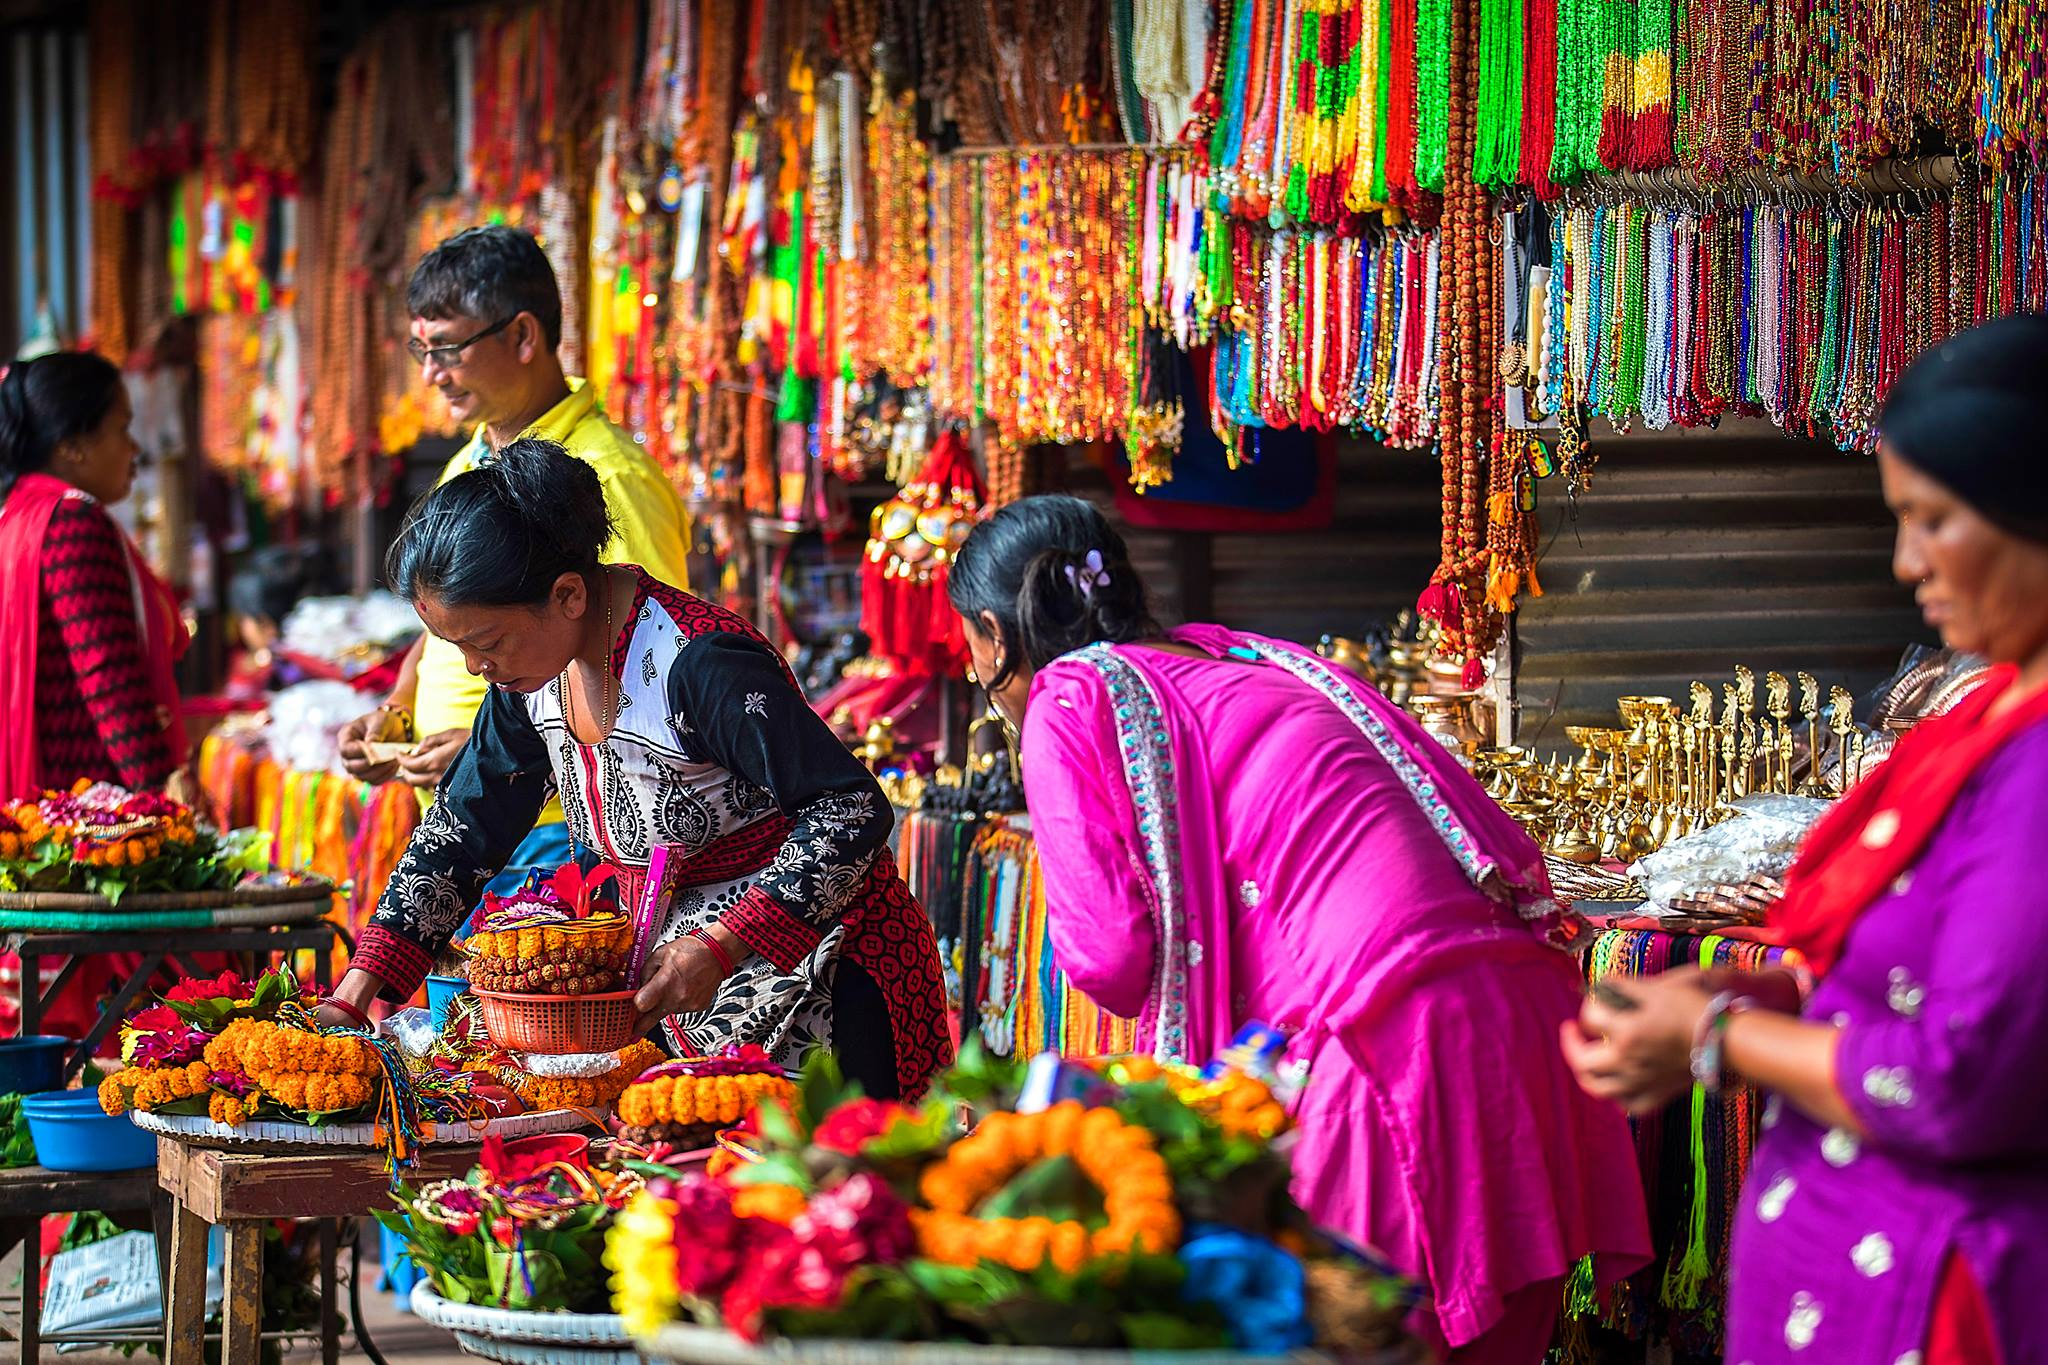 Simon+Needham+Humanitarian+Photography+Nepal+19.jpg